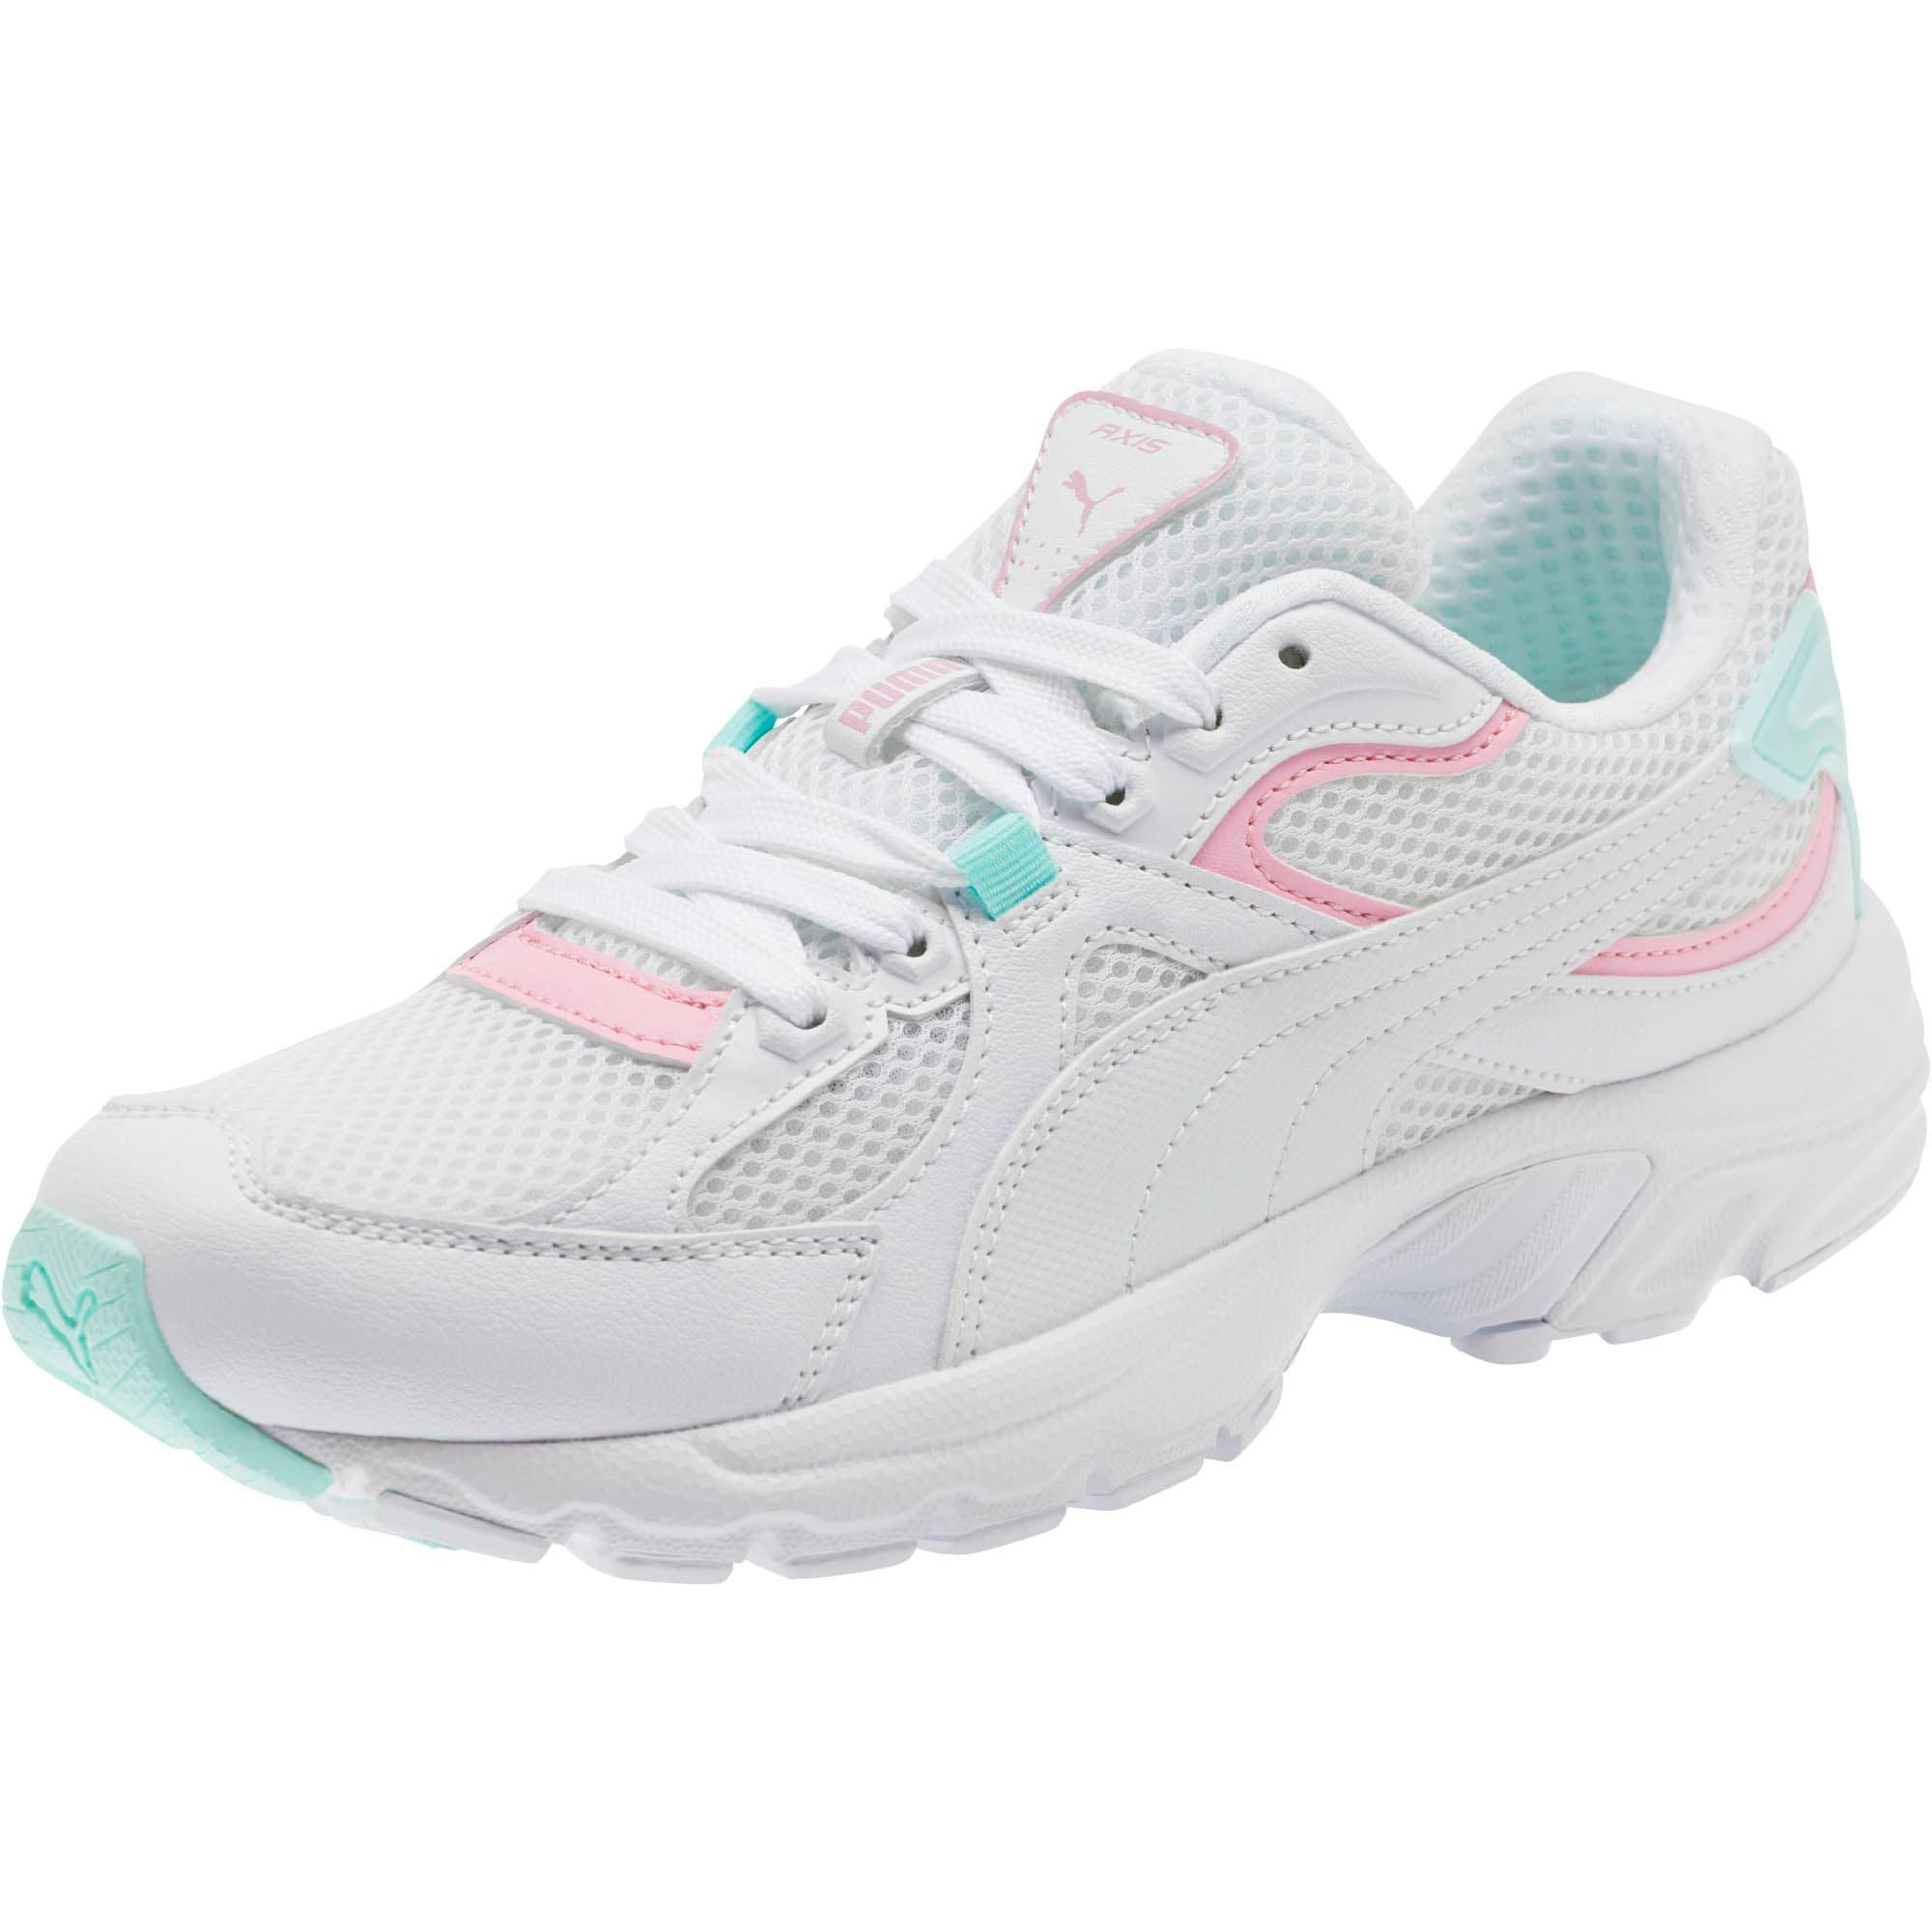 Puma Damen Chunky Sneaker Axis Plus 90s weiß Neu Kleidung